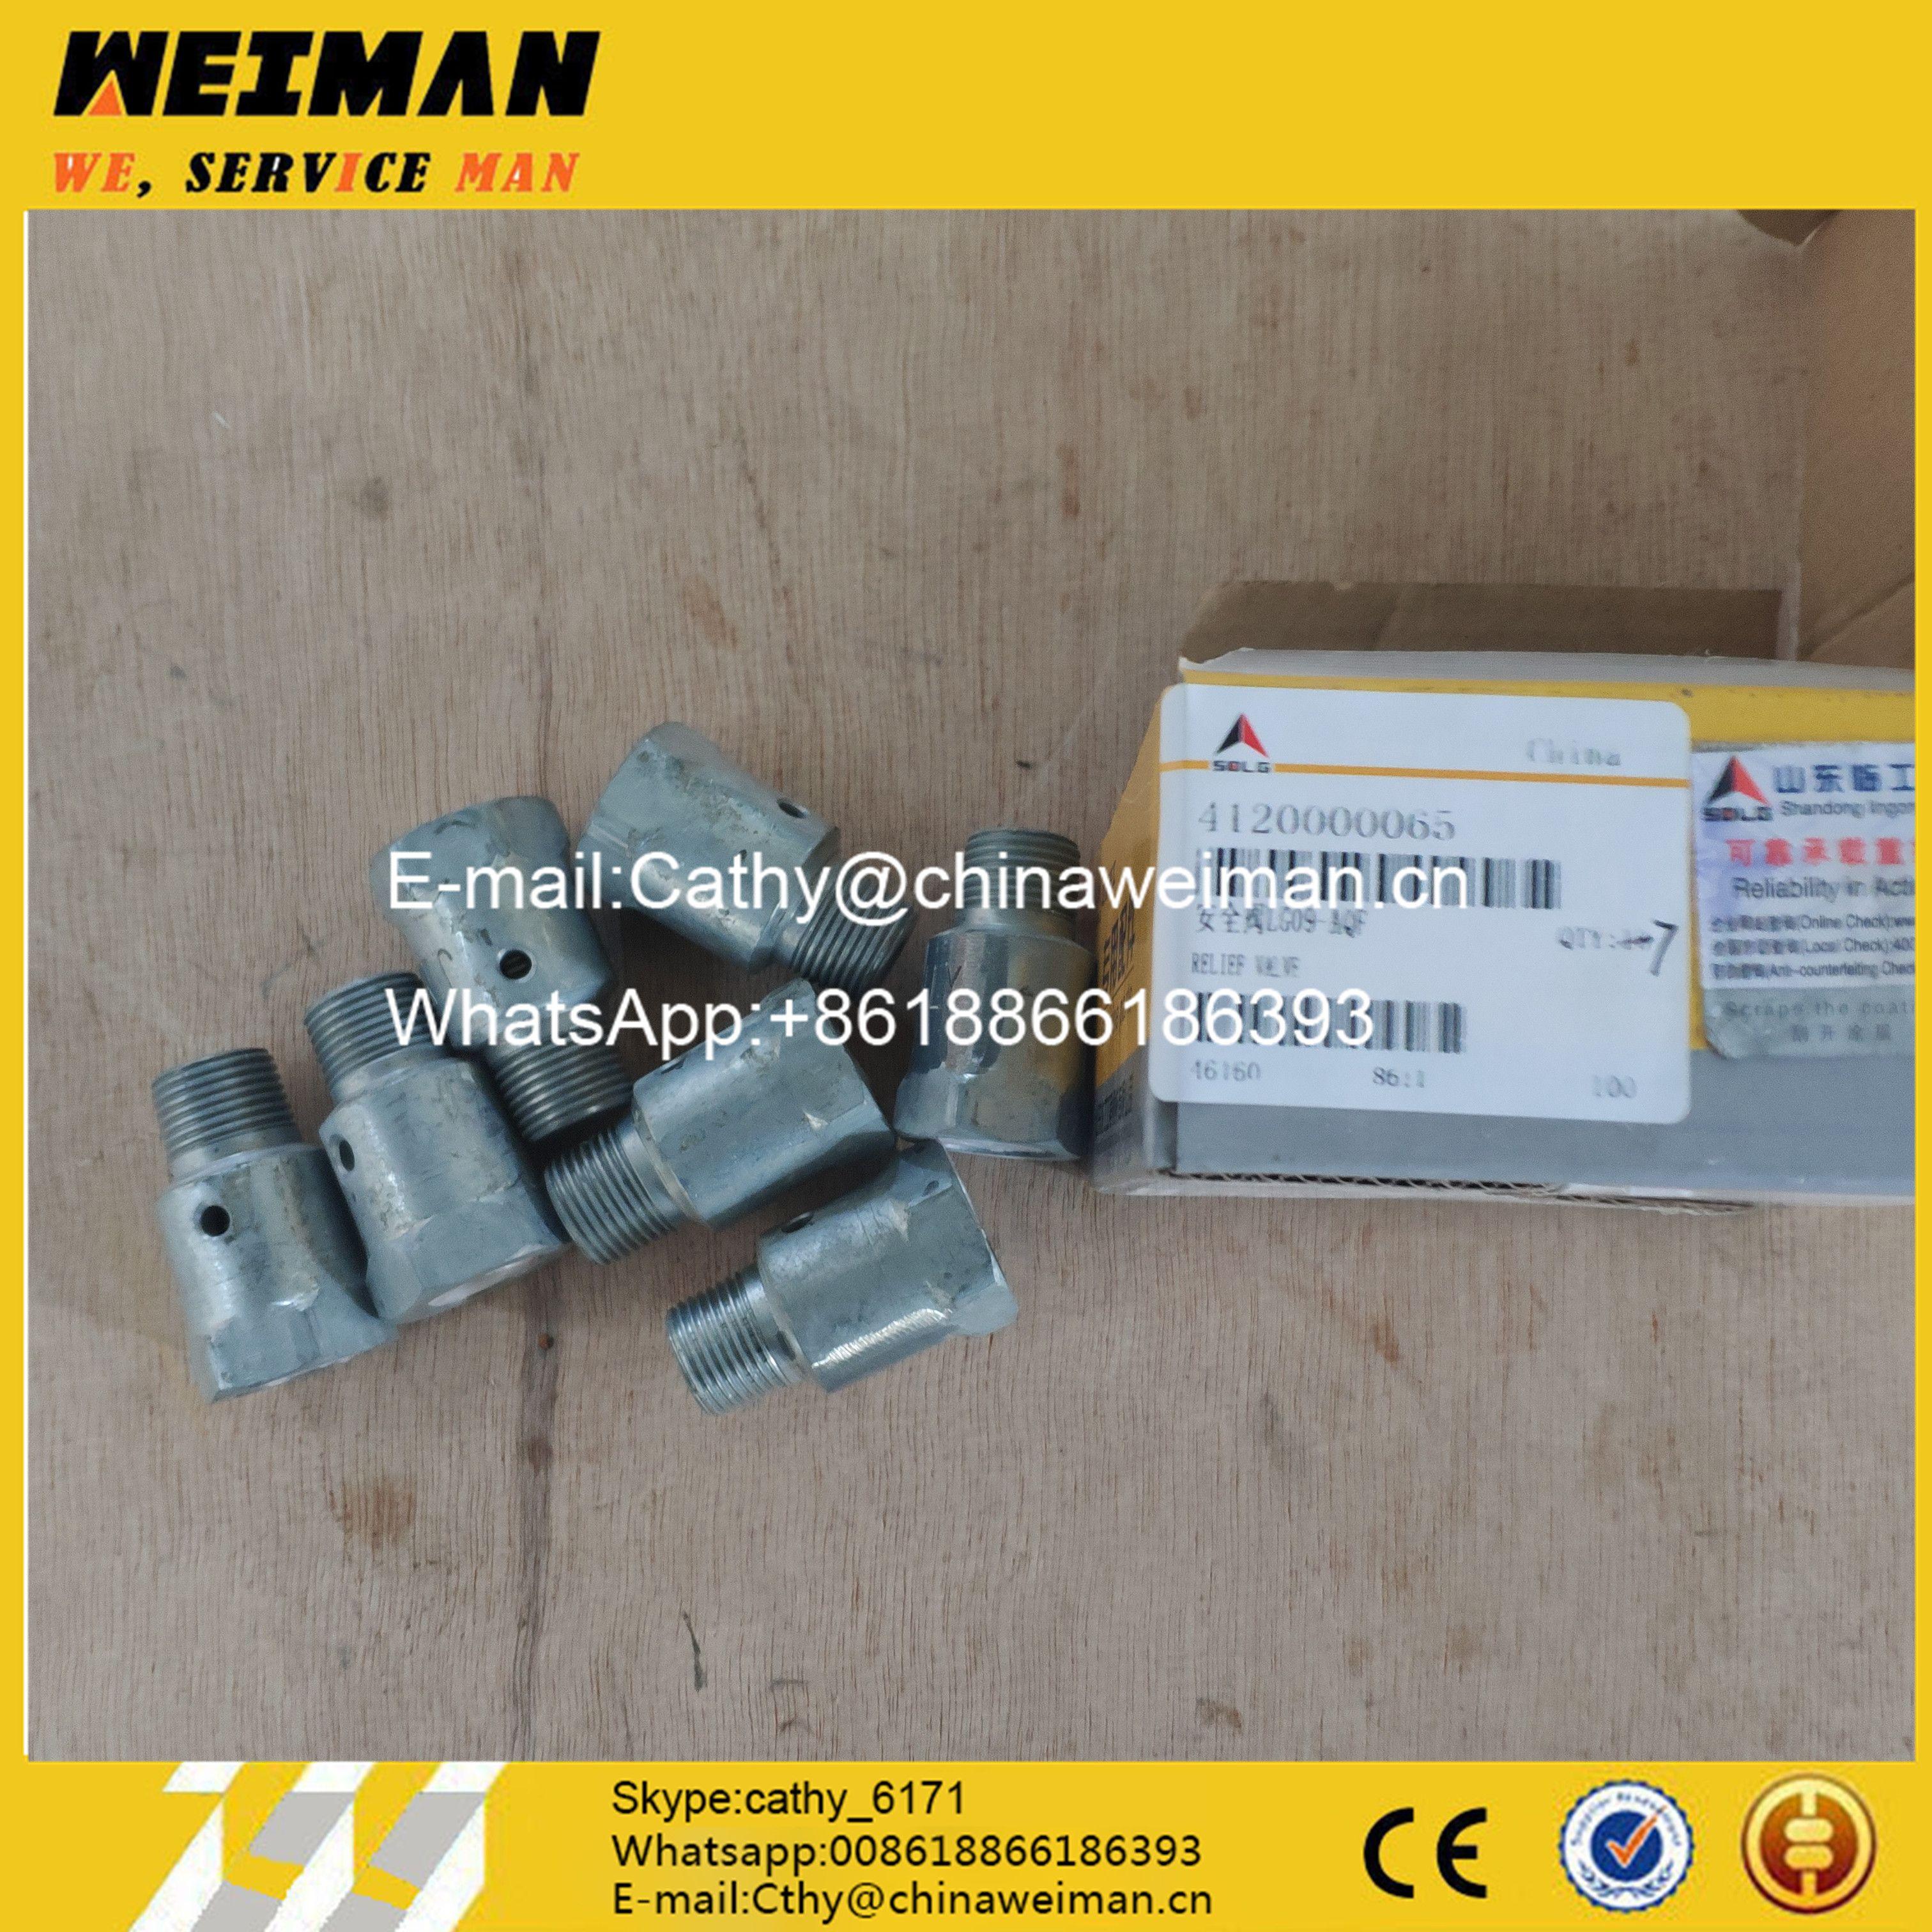 SDLG LG936L Brake System Spare Parts 4120000065 Safety